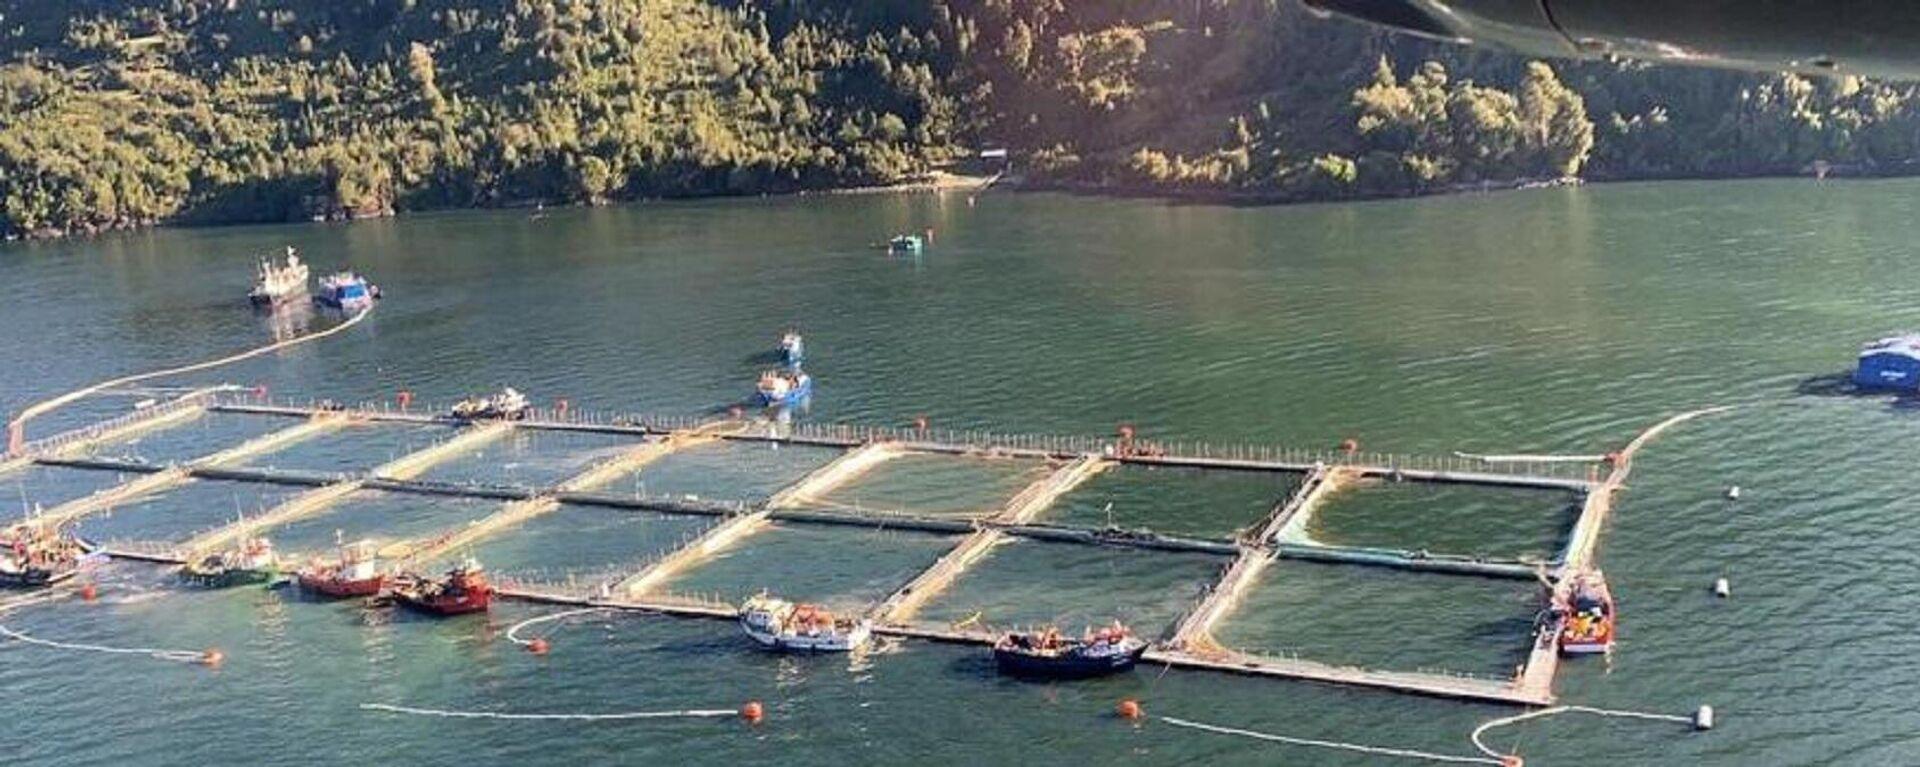 Salmonicultura en el fiordo Comau  - Sputnik Mundo, 1920, 12.07.2021